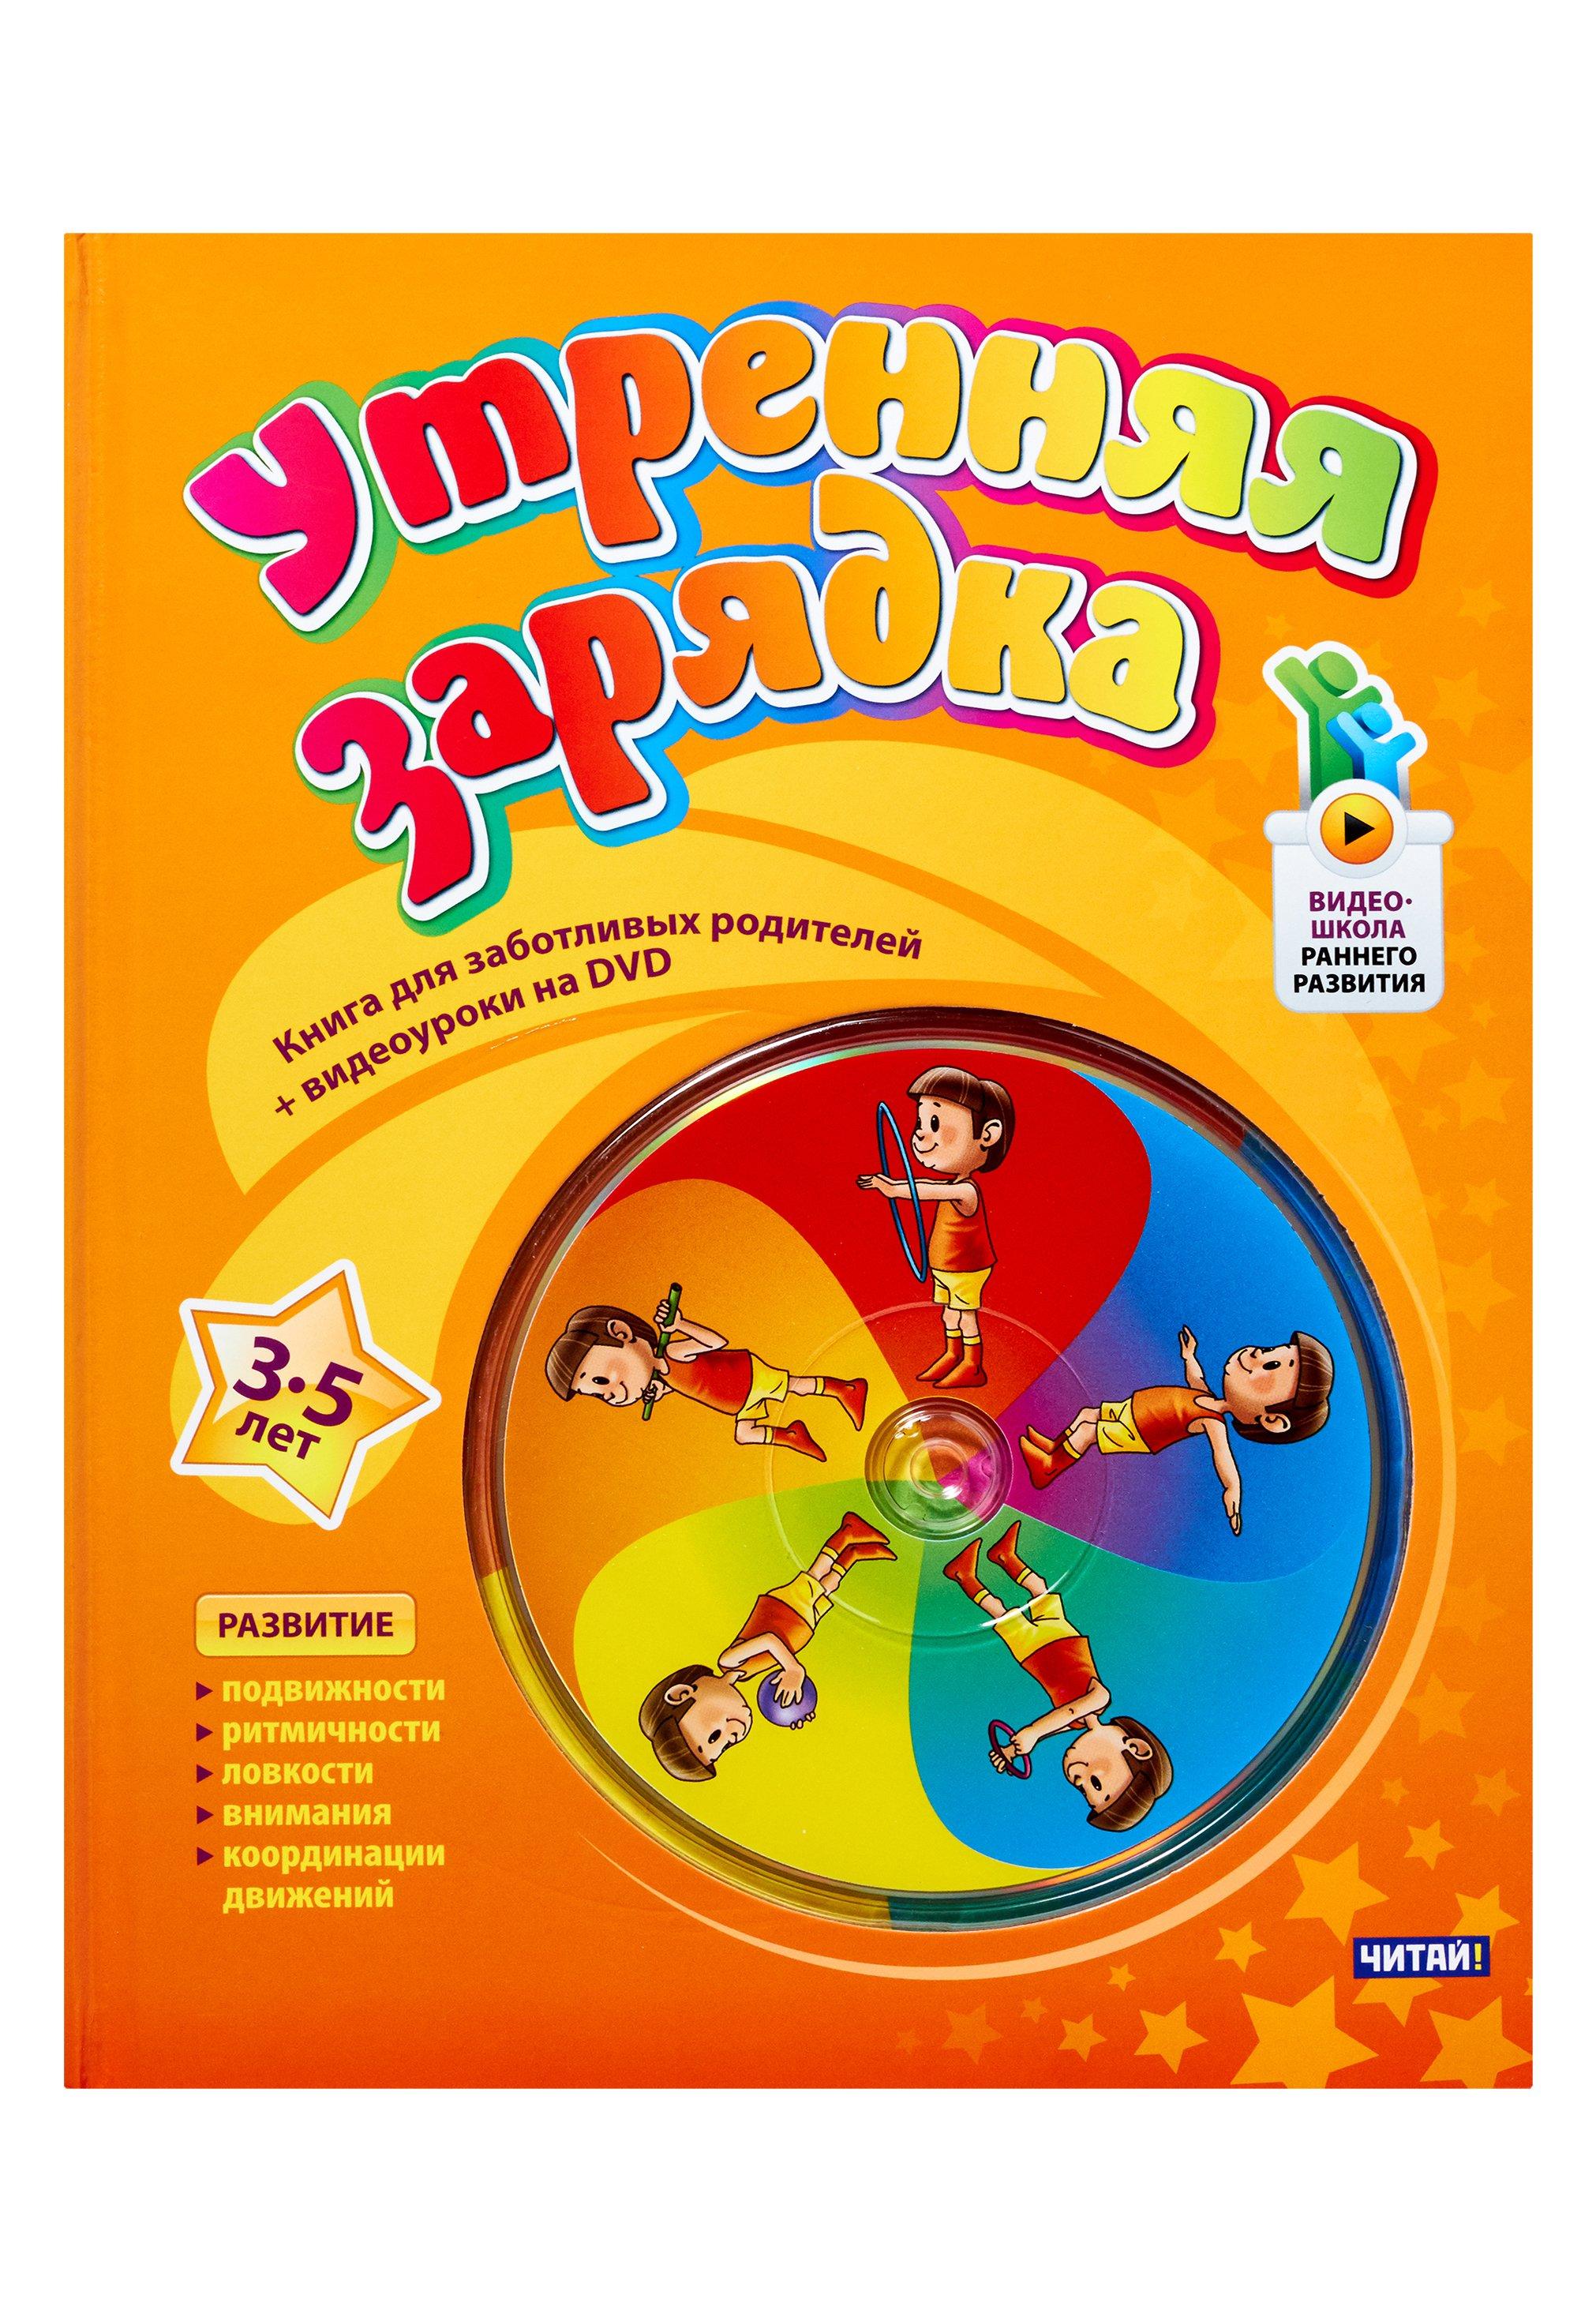 Волчкова И.М. Утренняя зарядка. От 3 до 5 лет+DVD